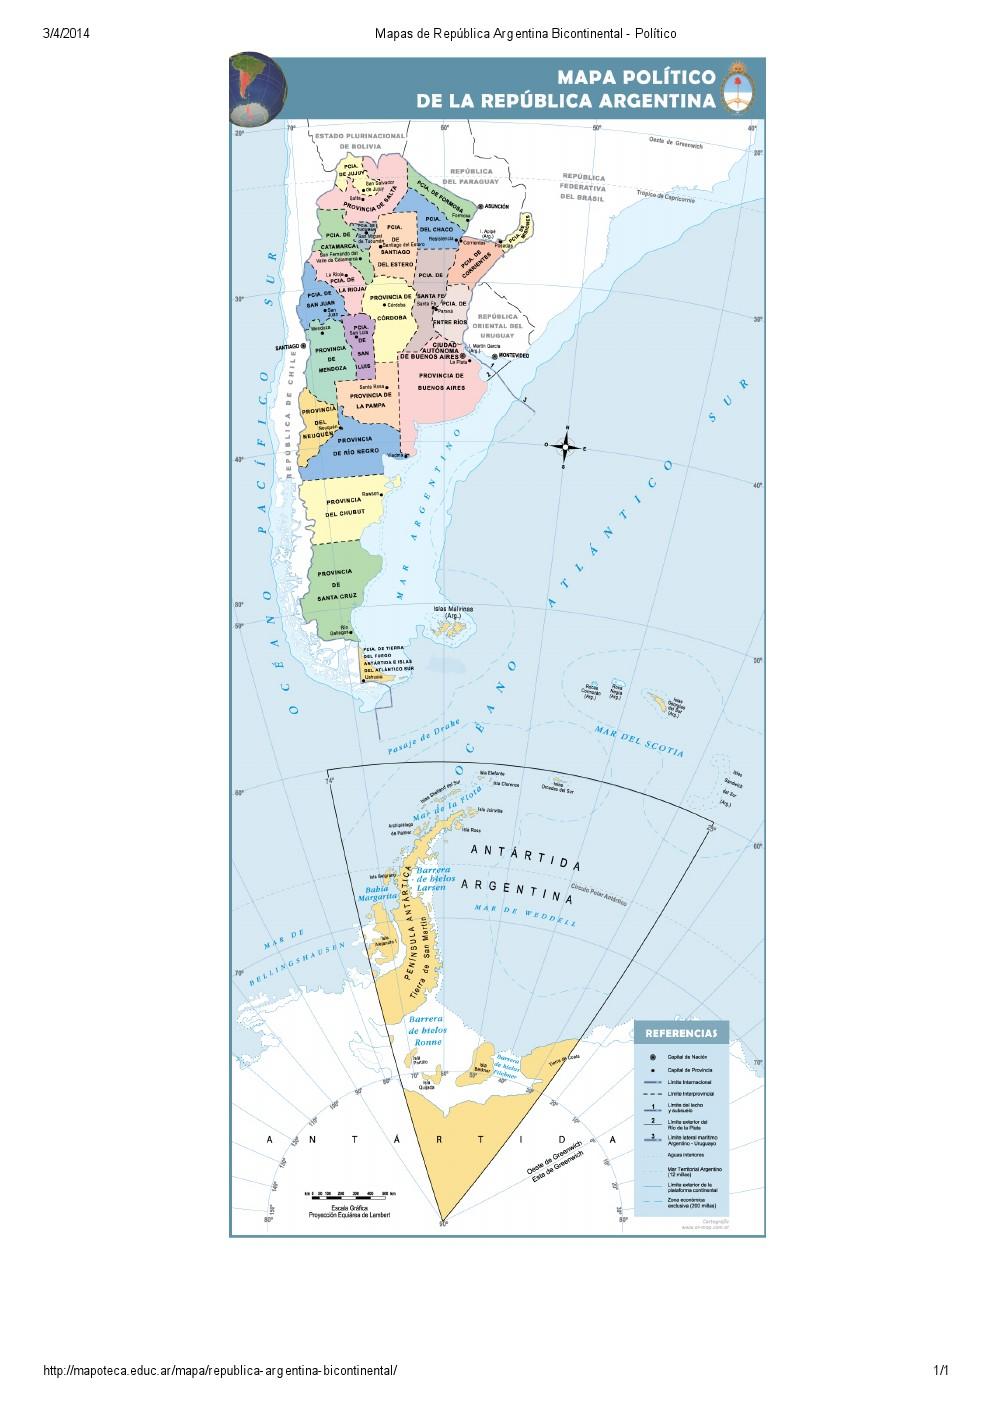 Mapa de provincias de Argentina bicontinental. Mapoteca de Educ.ar